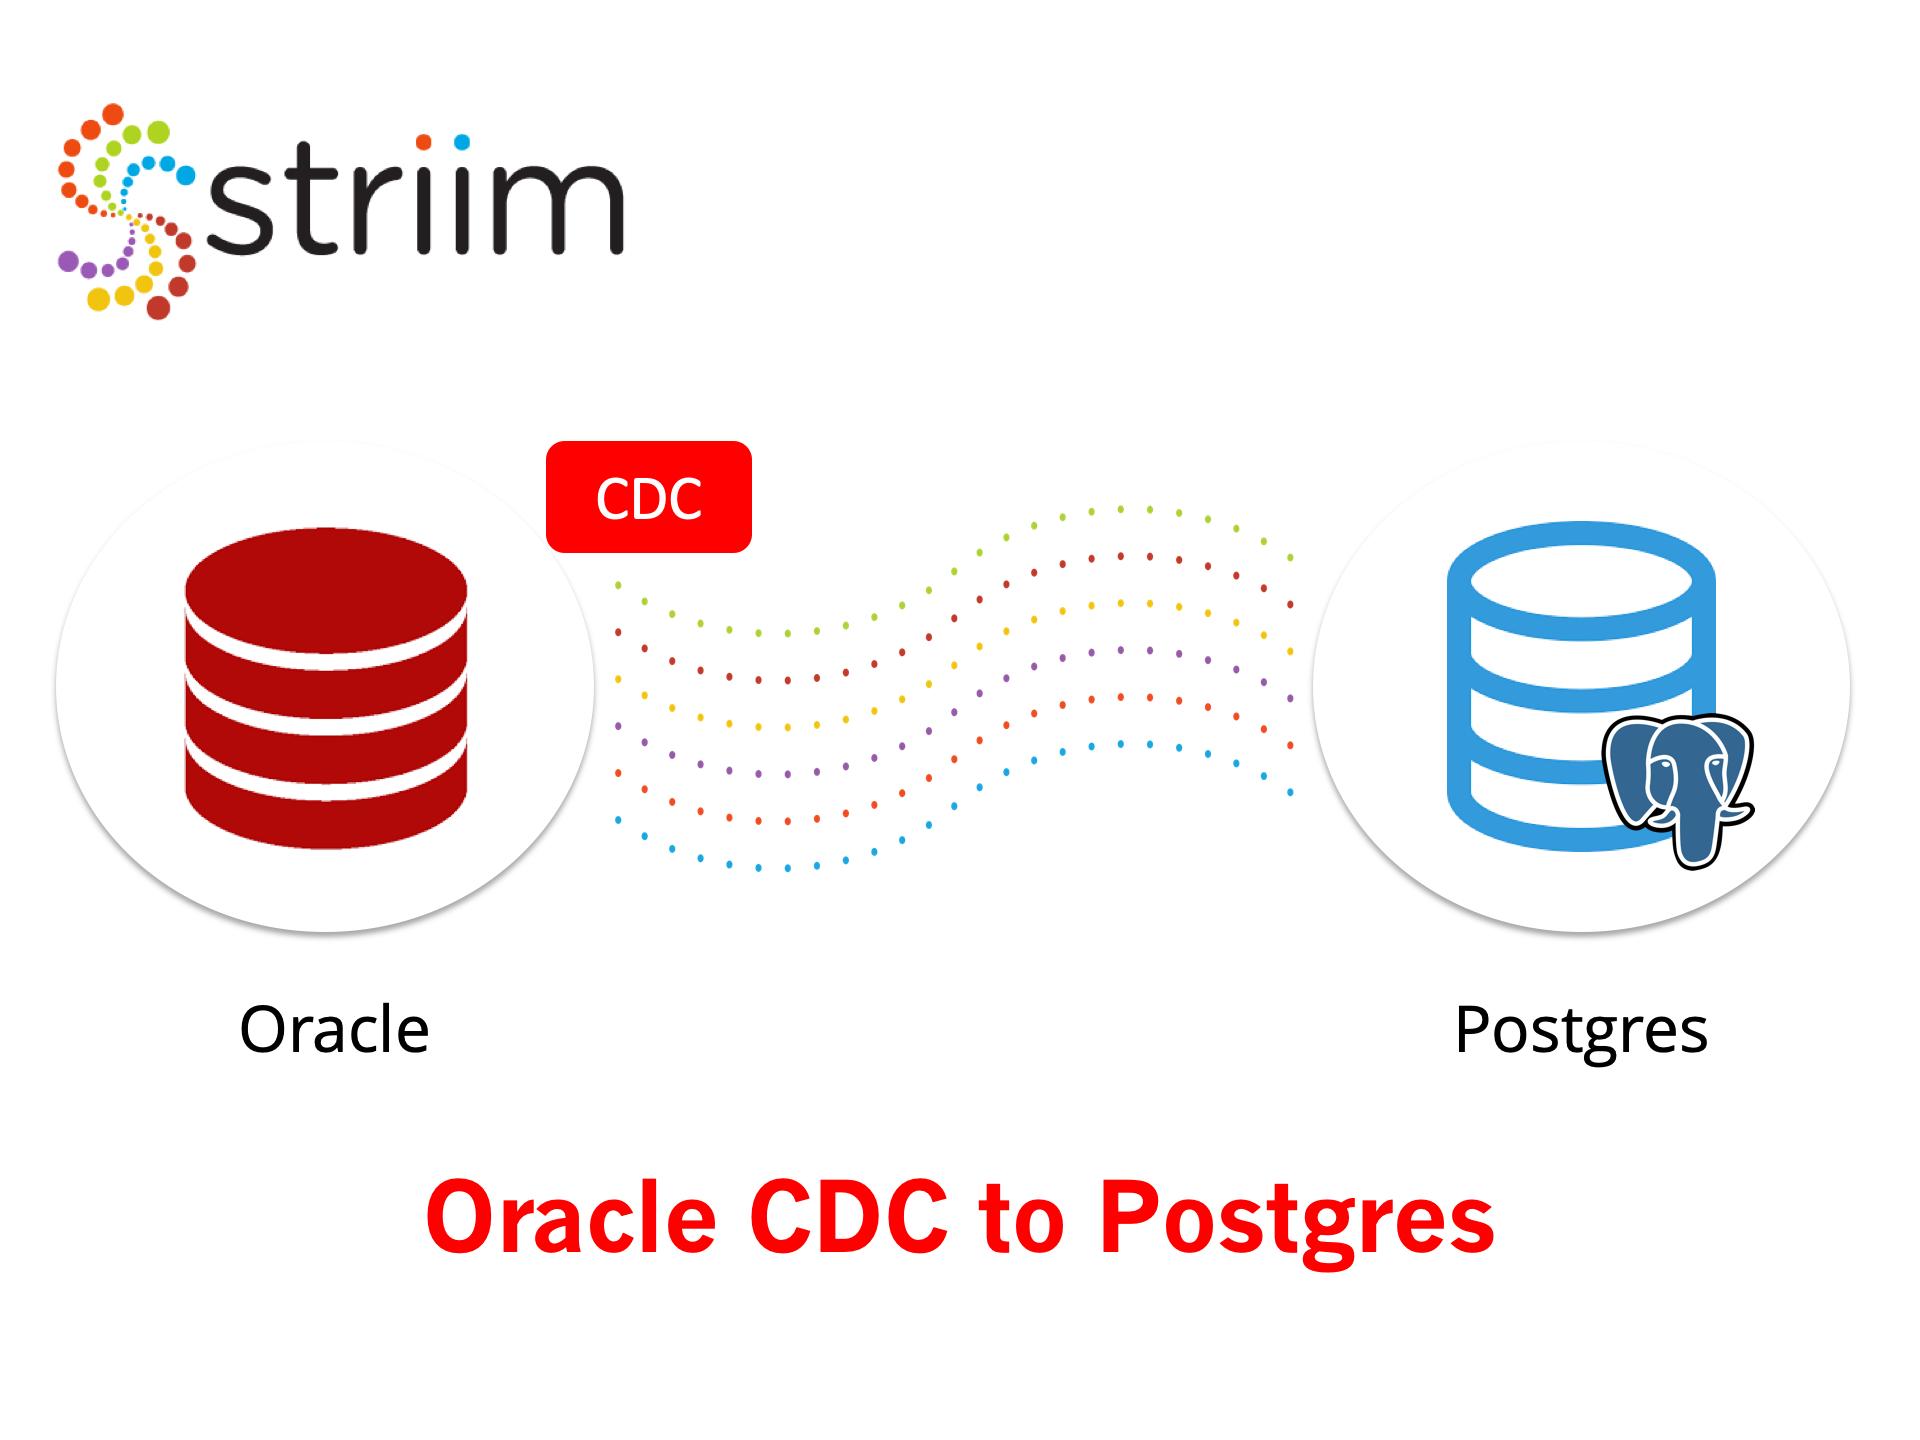 Oracle CDC to Postgres